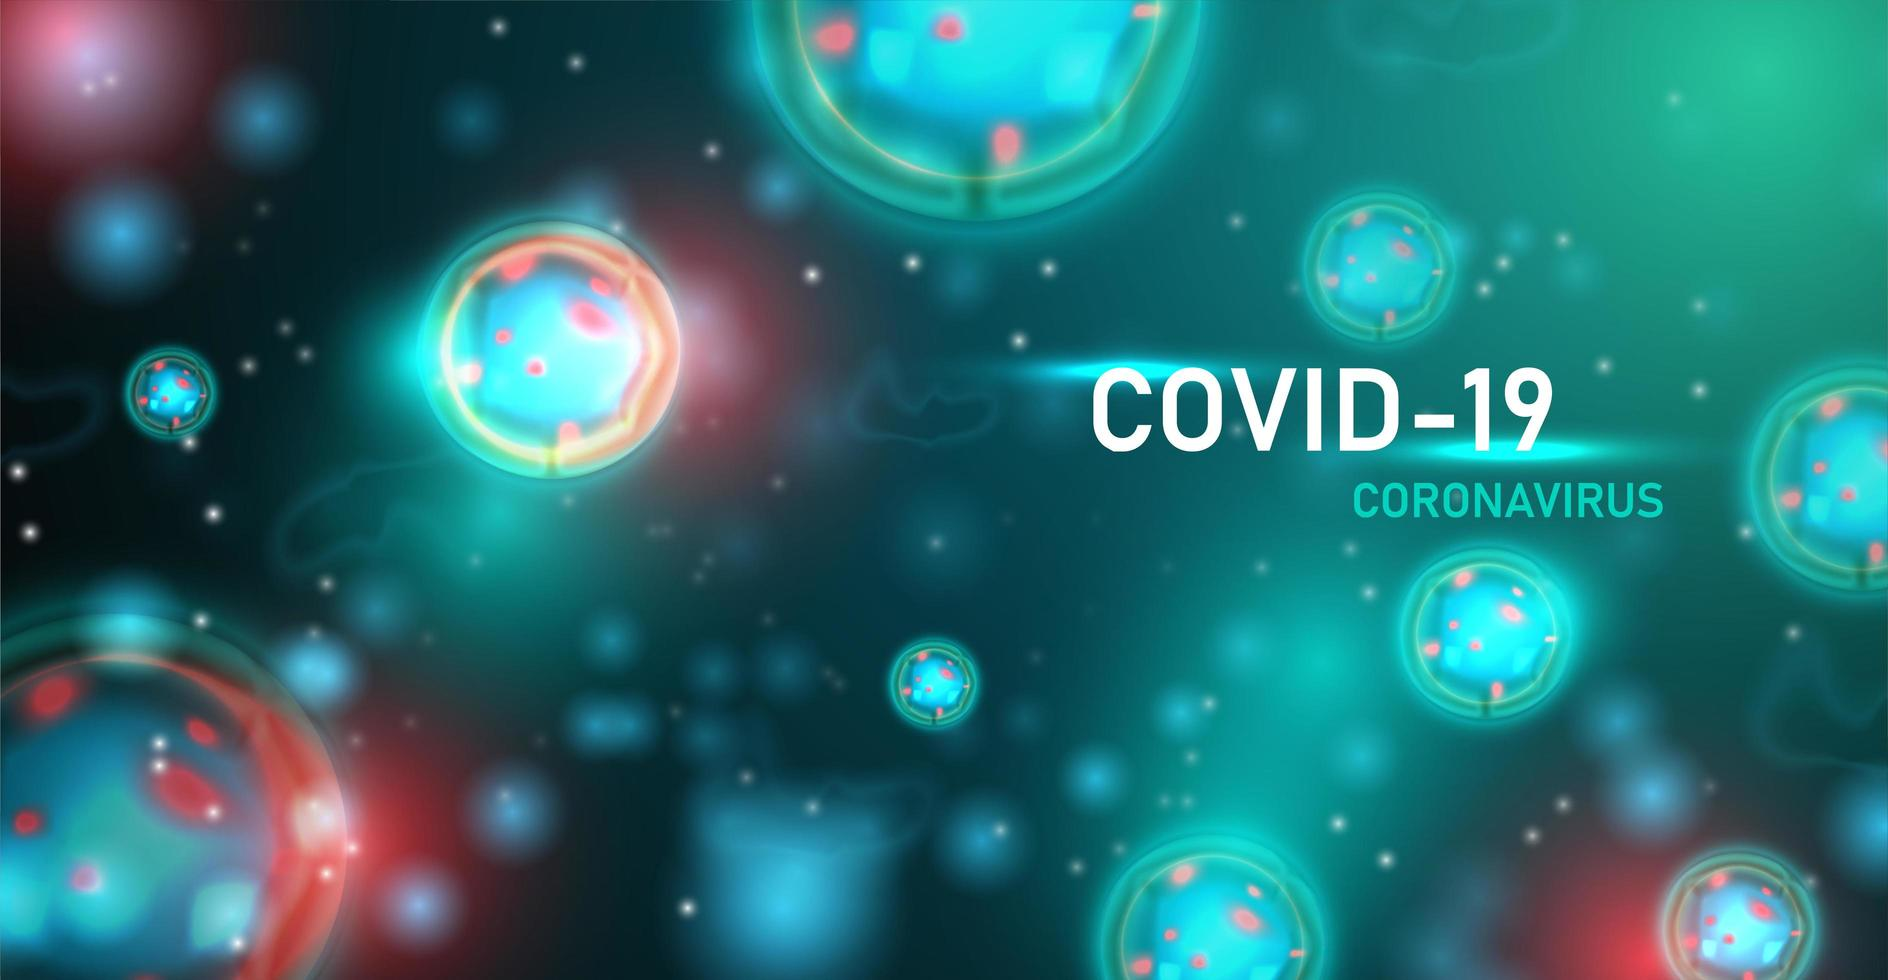 affiche d'infection de coronavirus vert vecteur